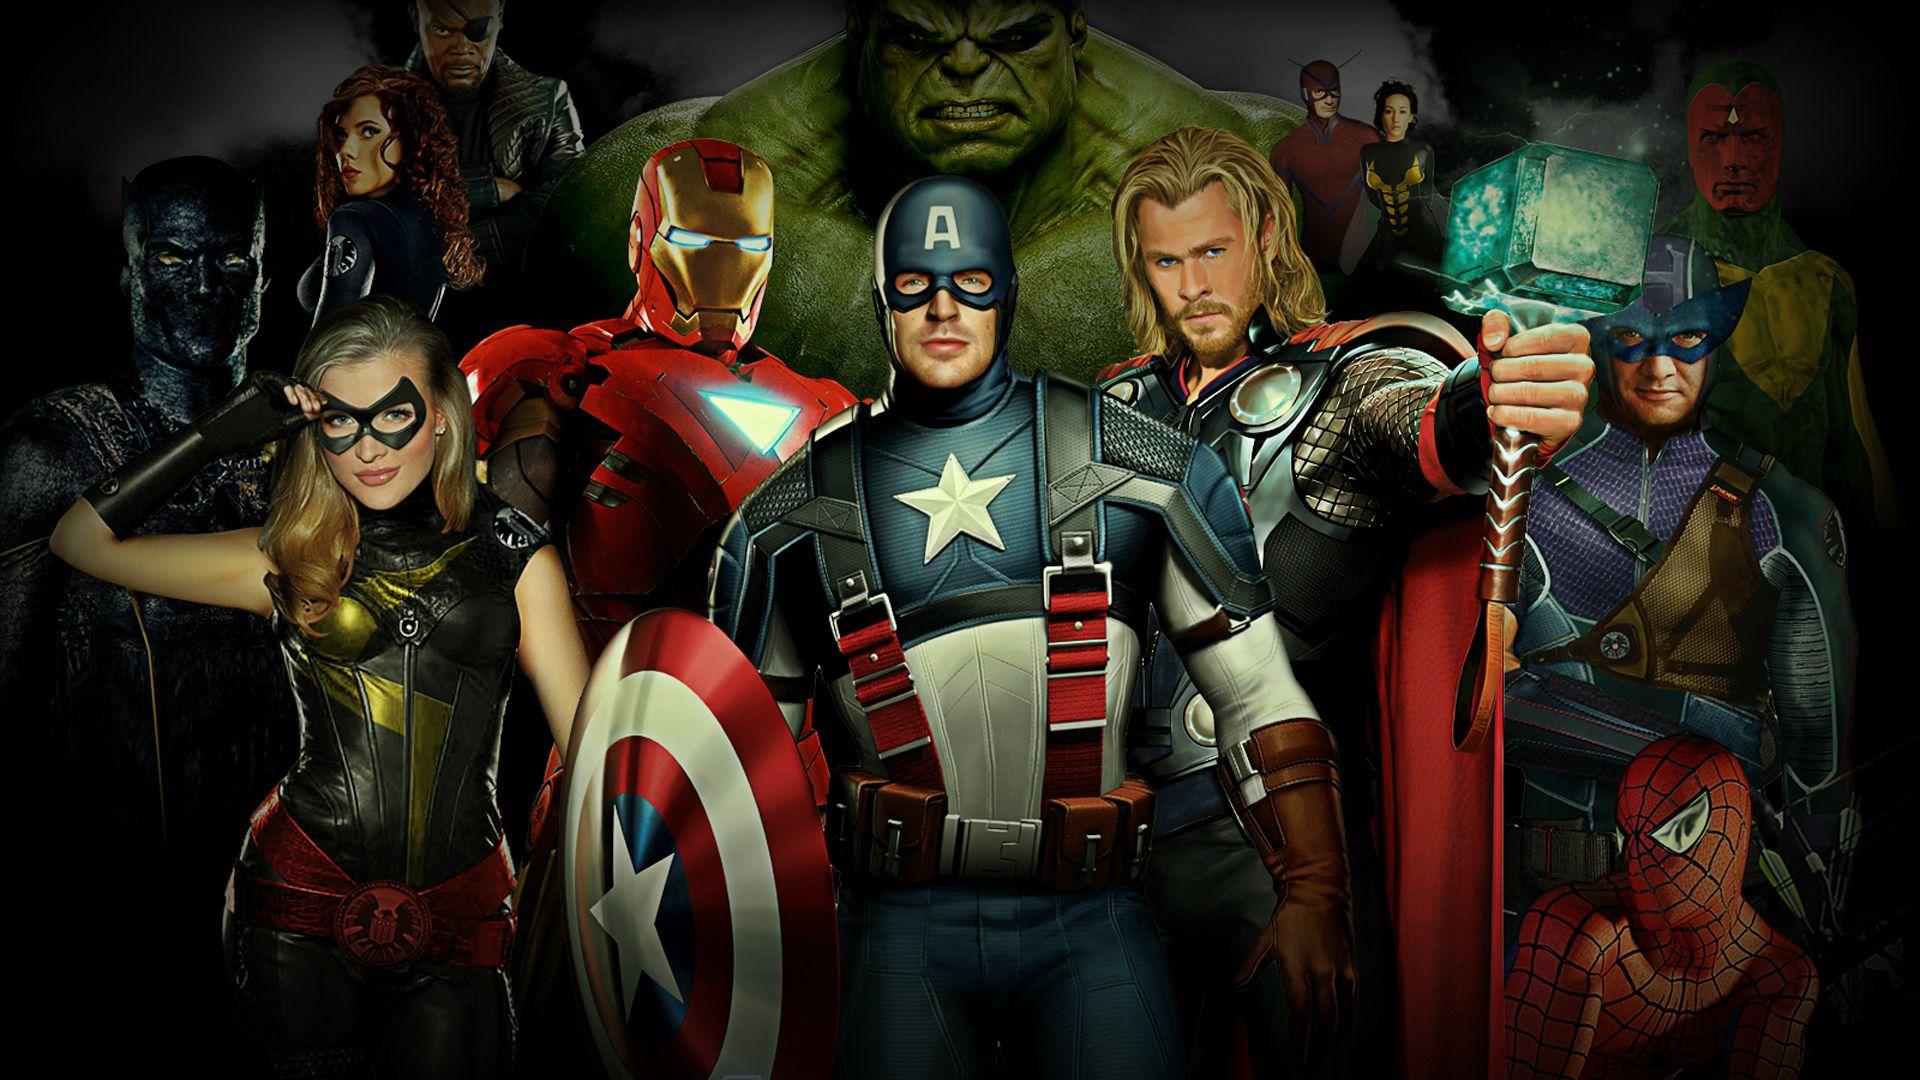 Hd wallpaper sites - Wallpapers For Marvel Wallpaper 1080p